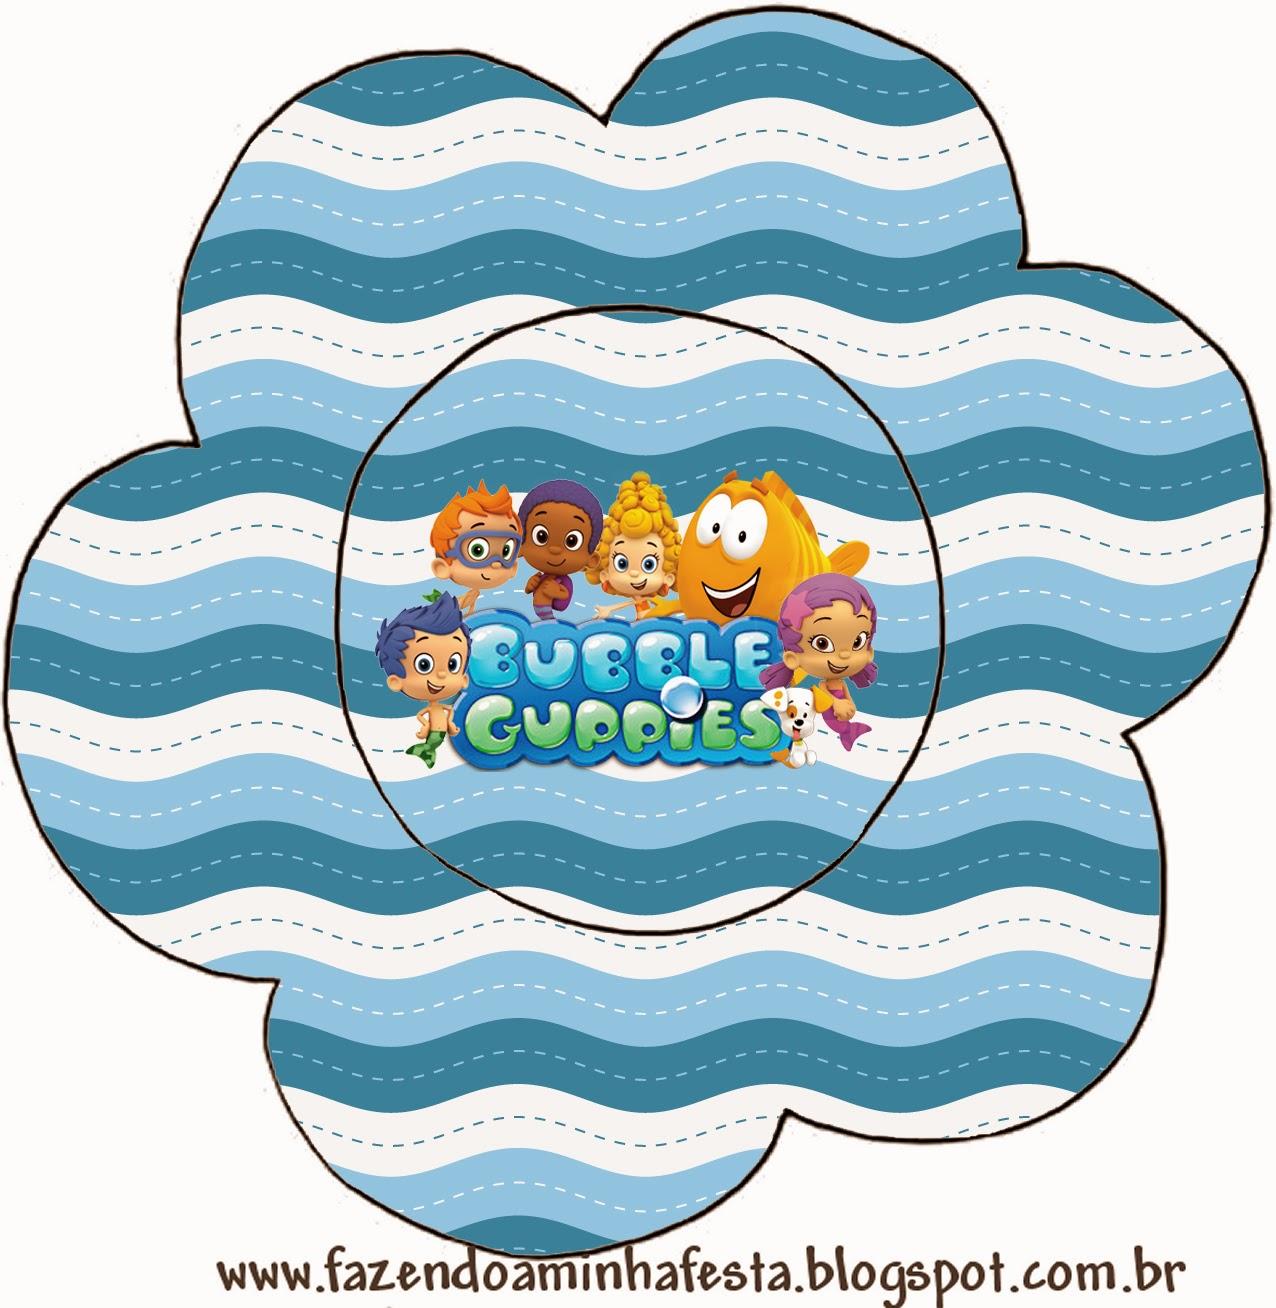 Bubble Guppies Free Printable Invitations